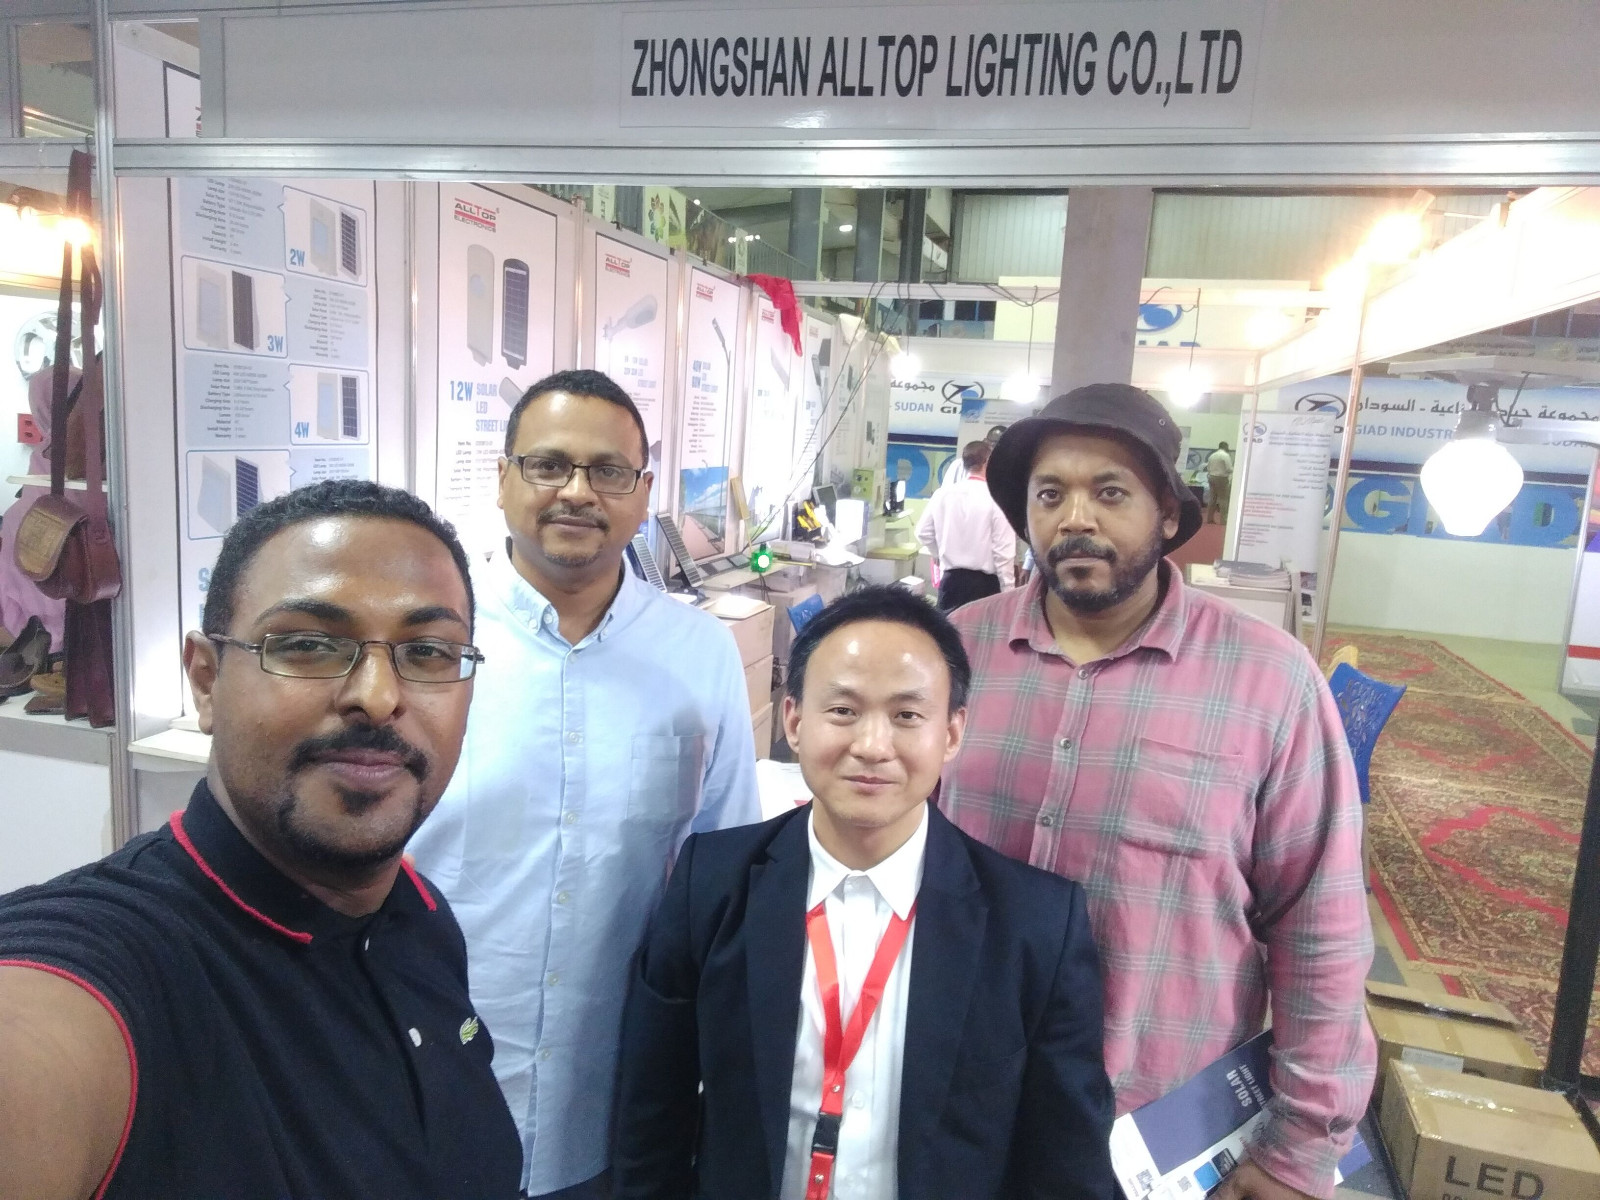 ALLTOP -Sudan China Exhibition 2018 10th-13th Mar, 2018 | Solarlights